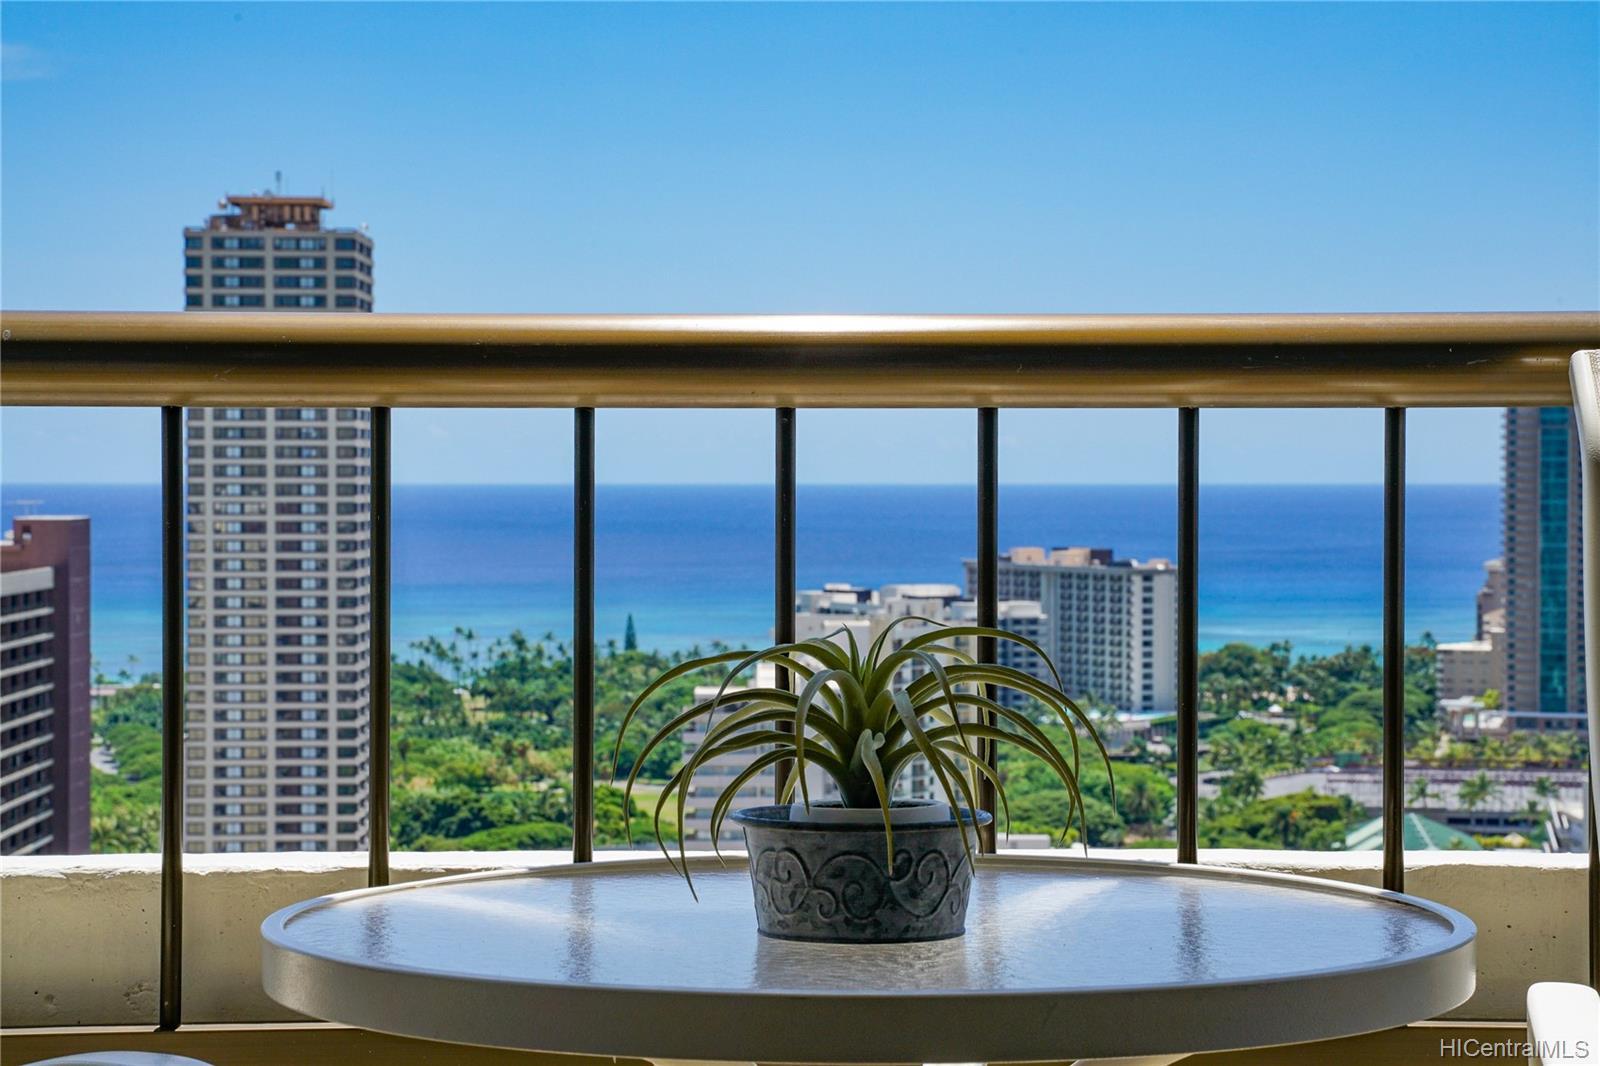 MARCO POLO APTS condo # 2909, Honolulu, Hawaii - photo 15 of 25